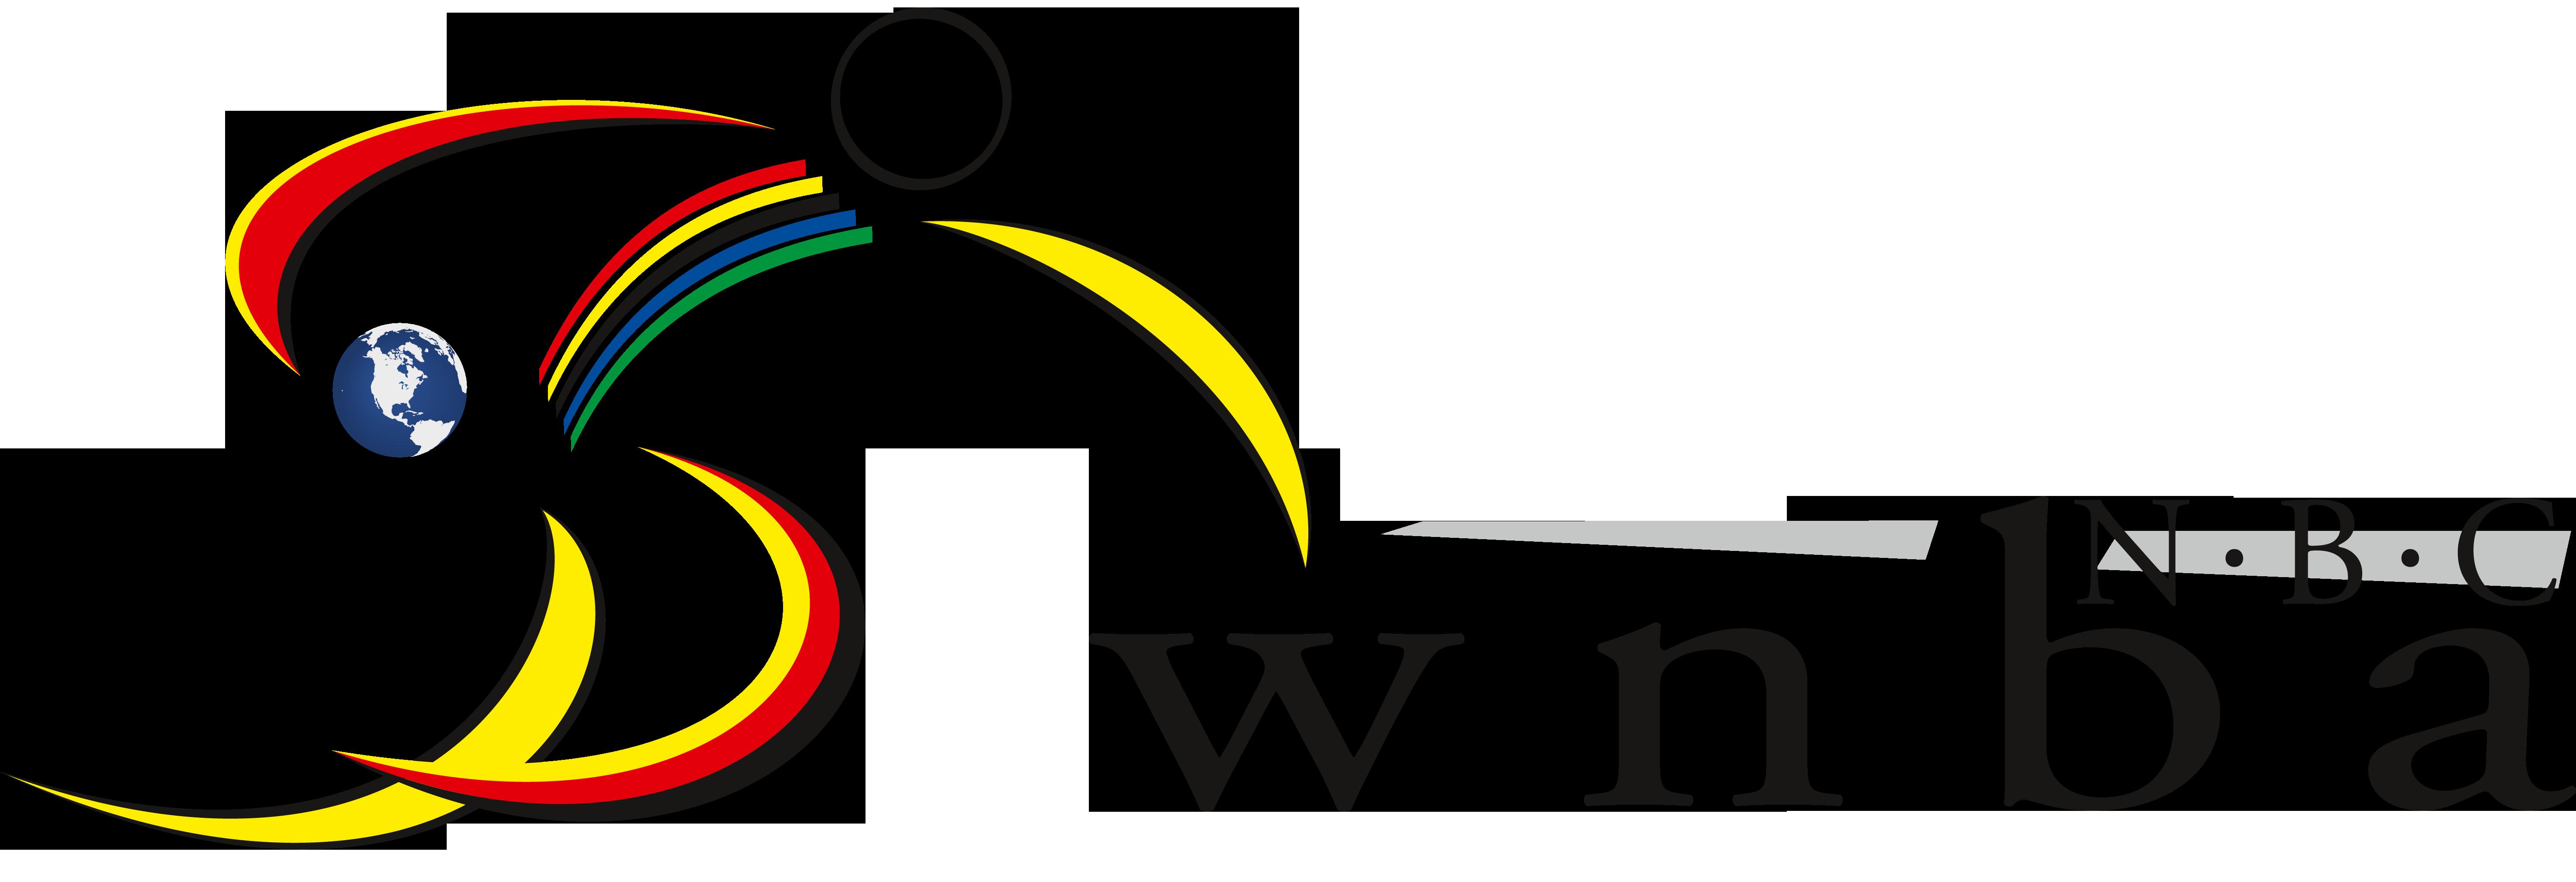 Wm logo wnba nbc